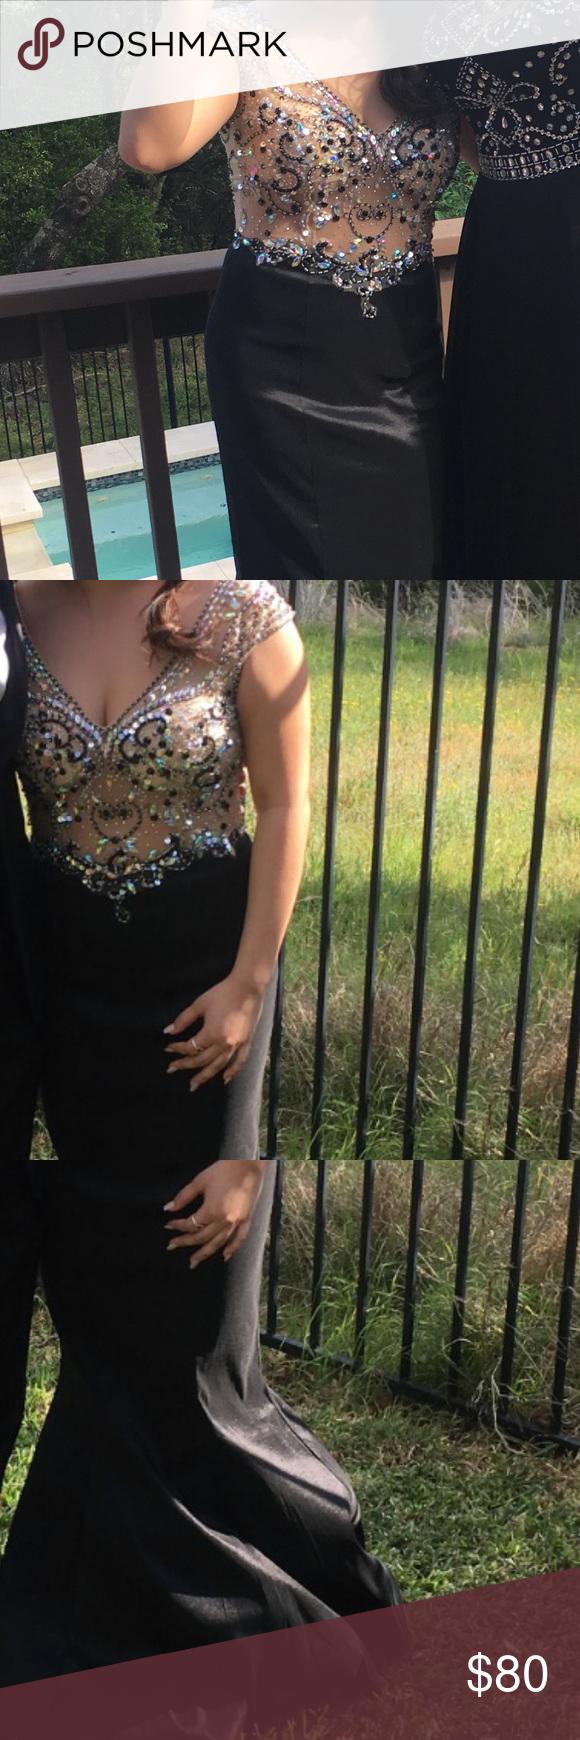 Mermaid style prom dress from promgirl my posh picks